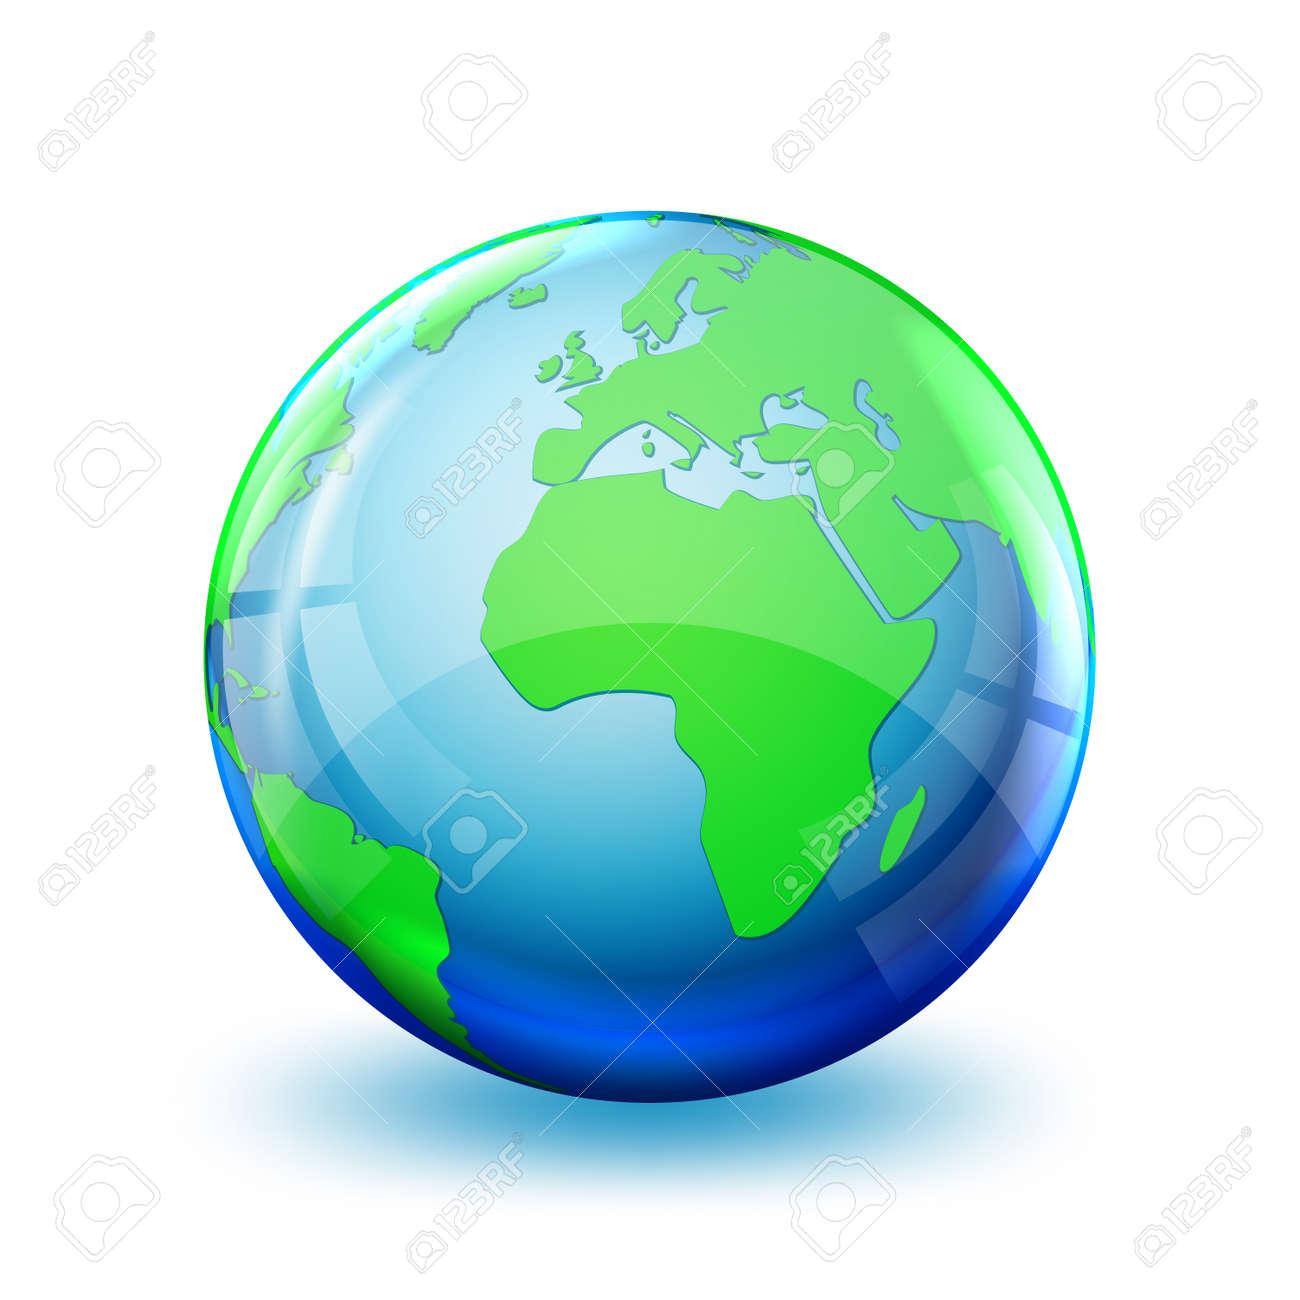 Earth globe icon isolated. 3D globe. Glossy world map. Vector illustration. - 155511962